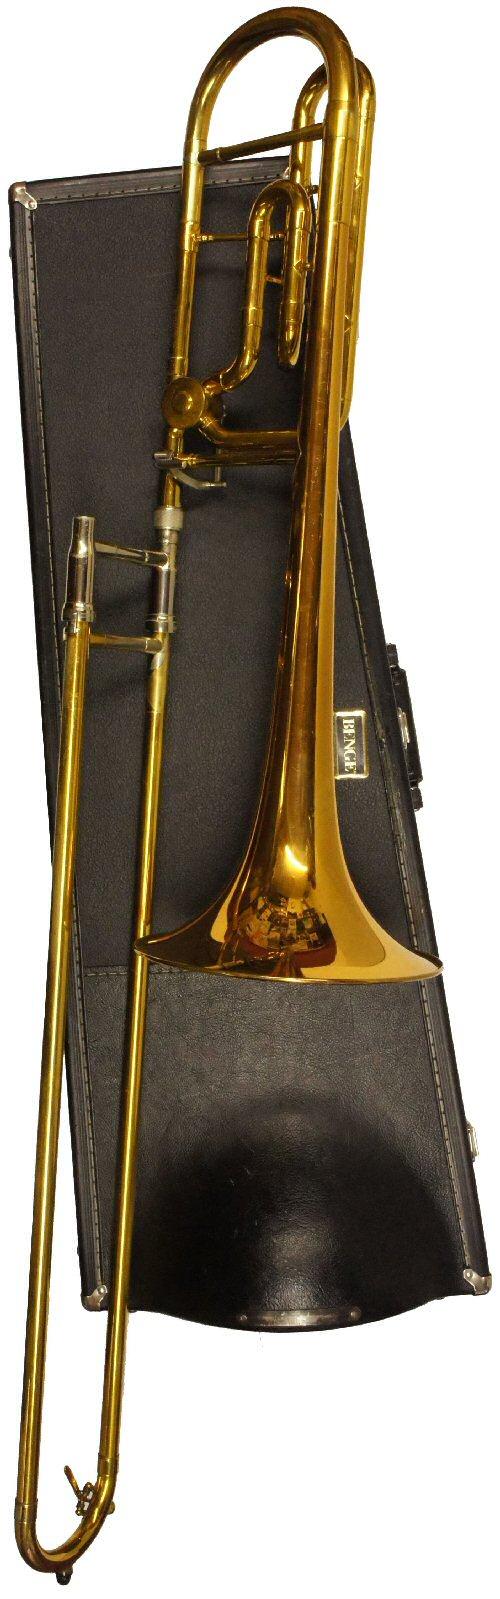 Second Hand Benge 165F Trombone